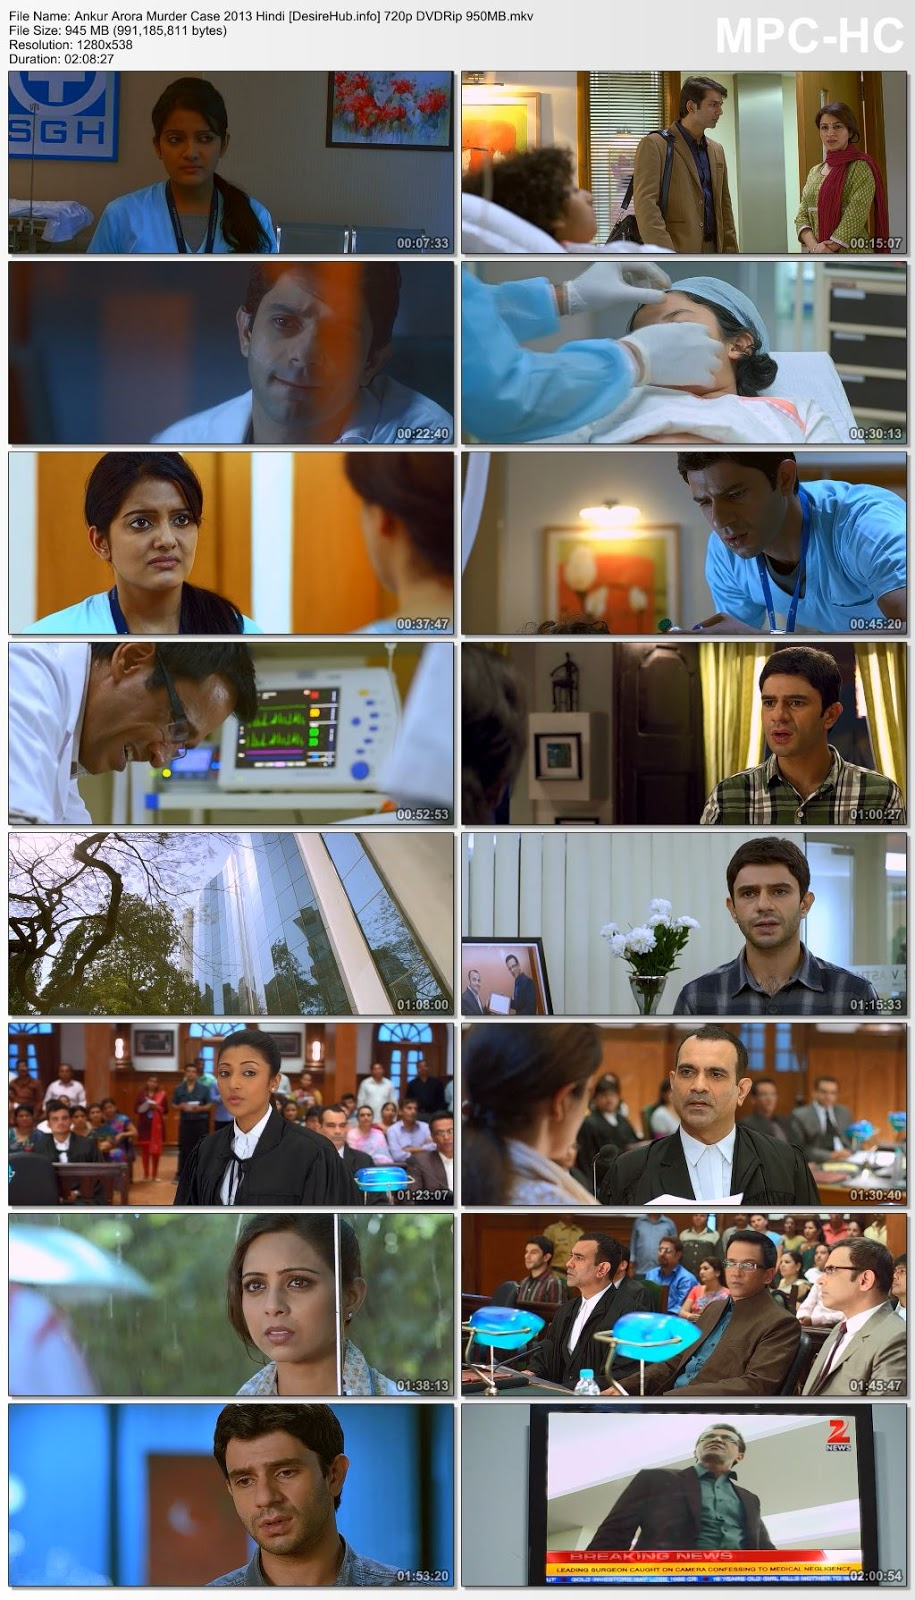 Ankur Arora Murder Case 2013 Hindi 480p DVDRip 350MB Desirehub